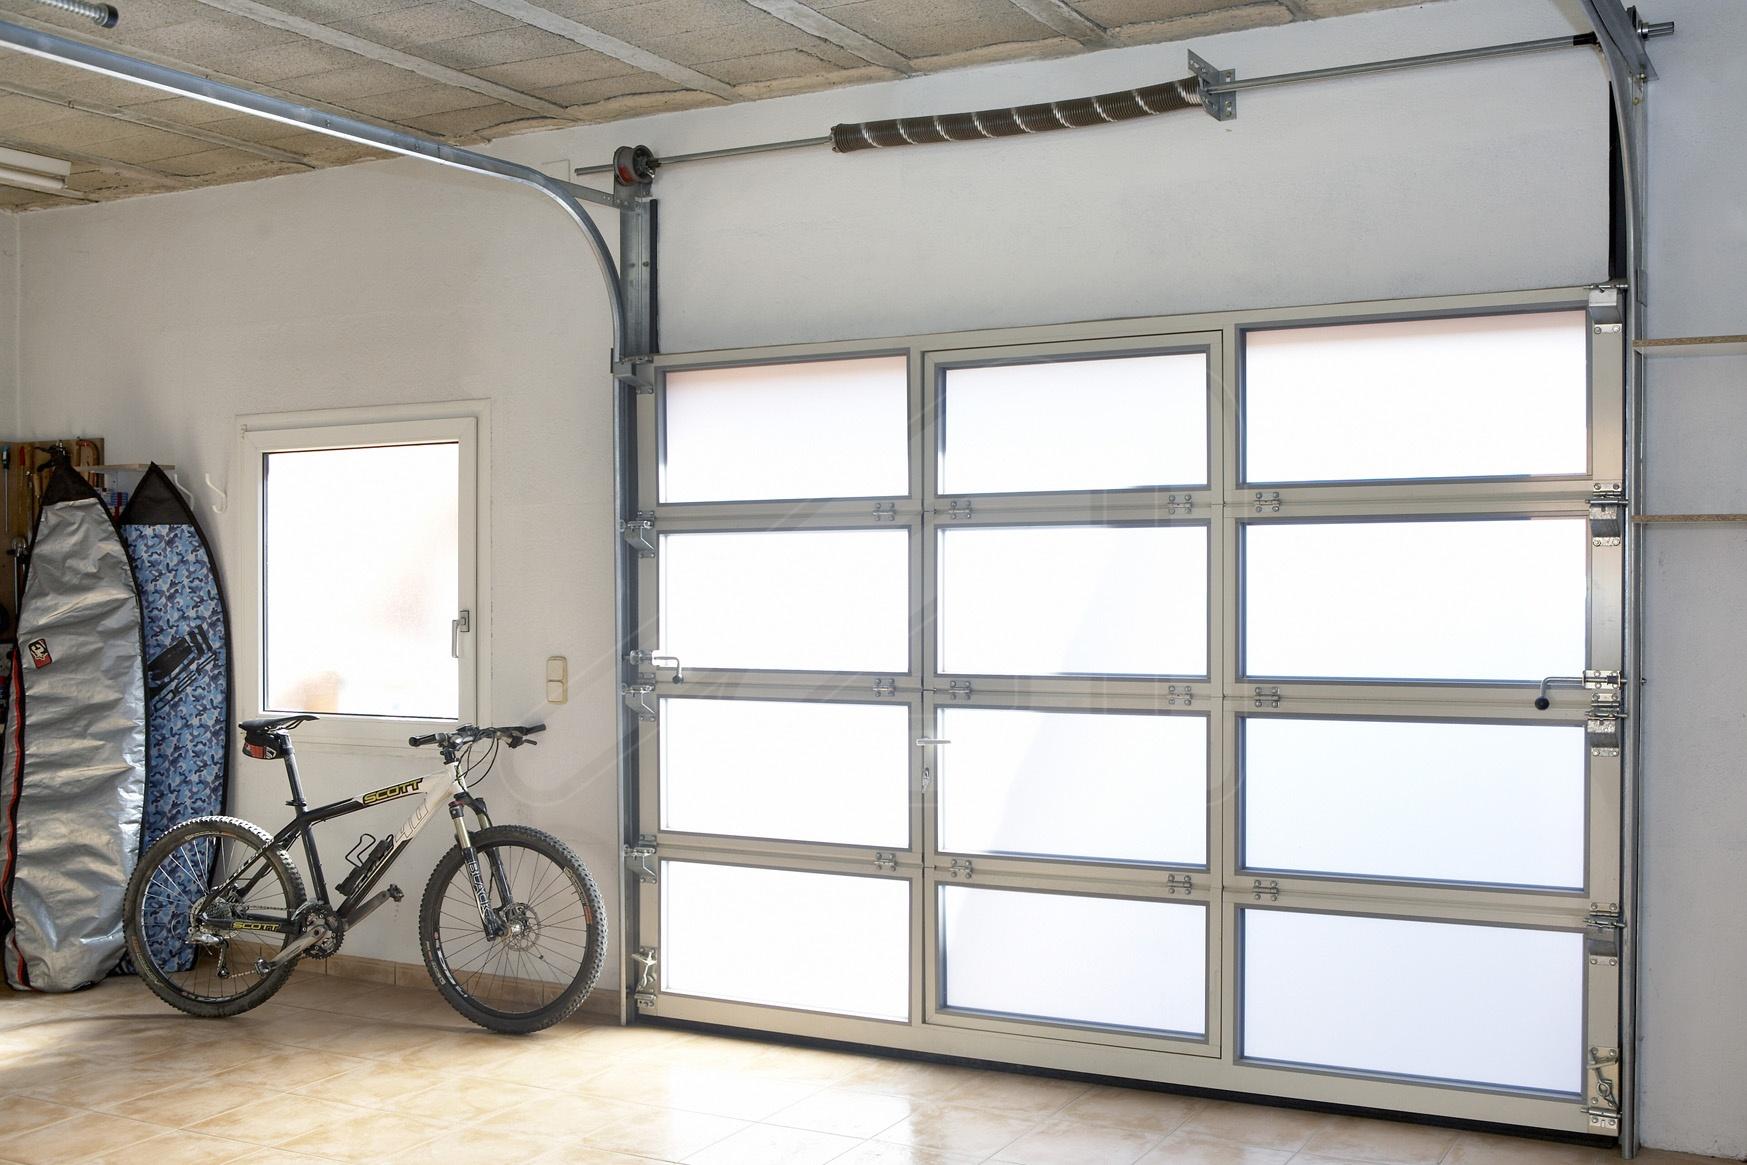 puerta de garaje seccional panel s ndwich angel mir